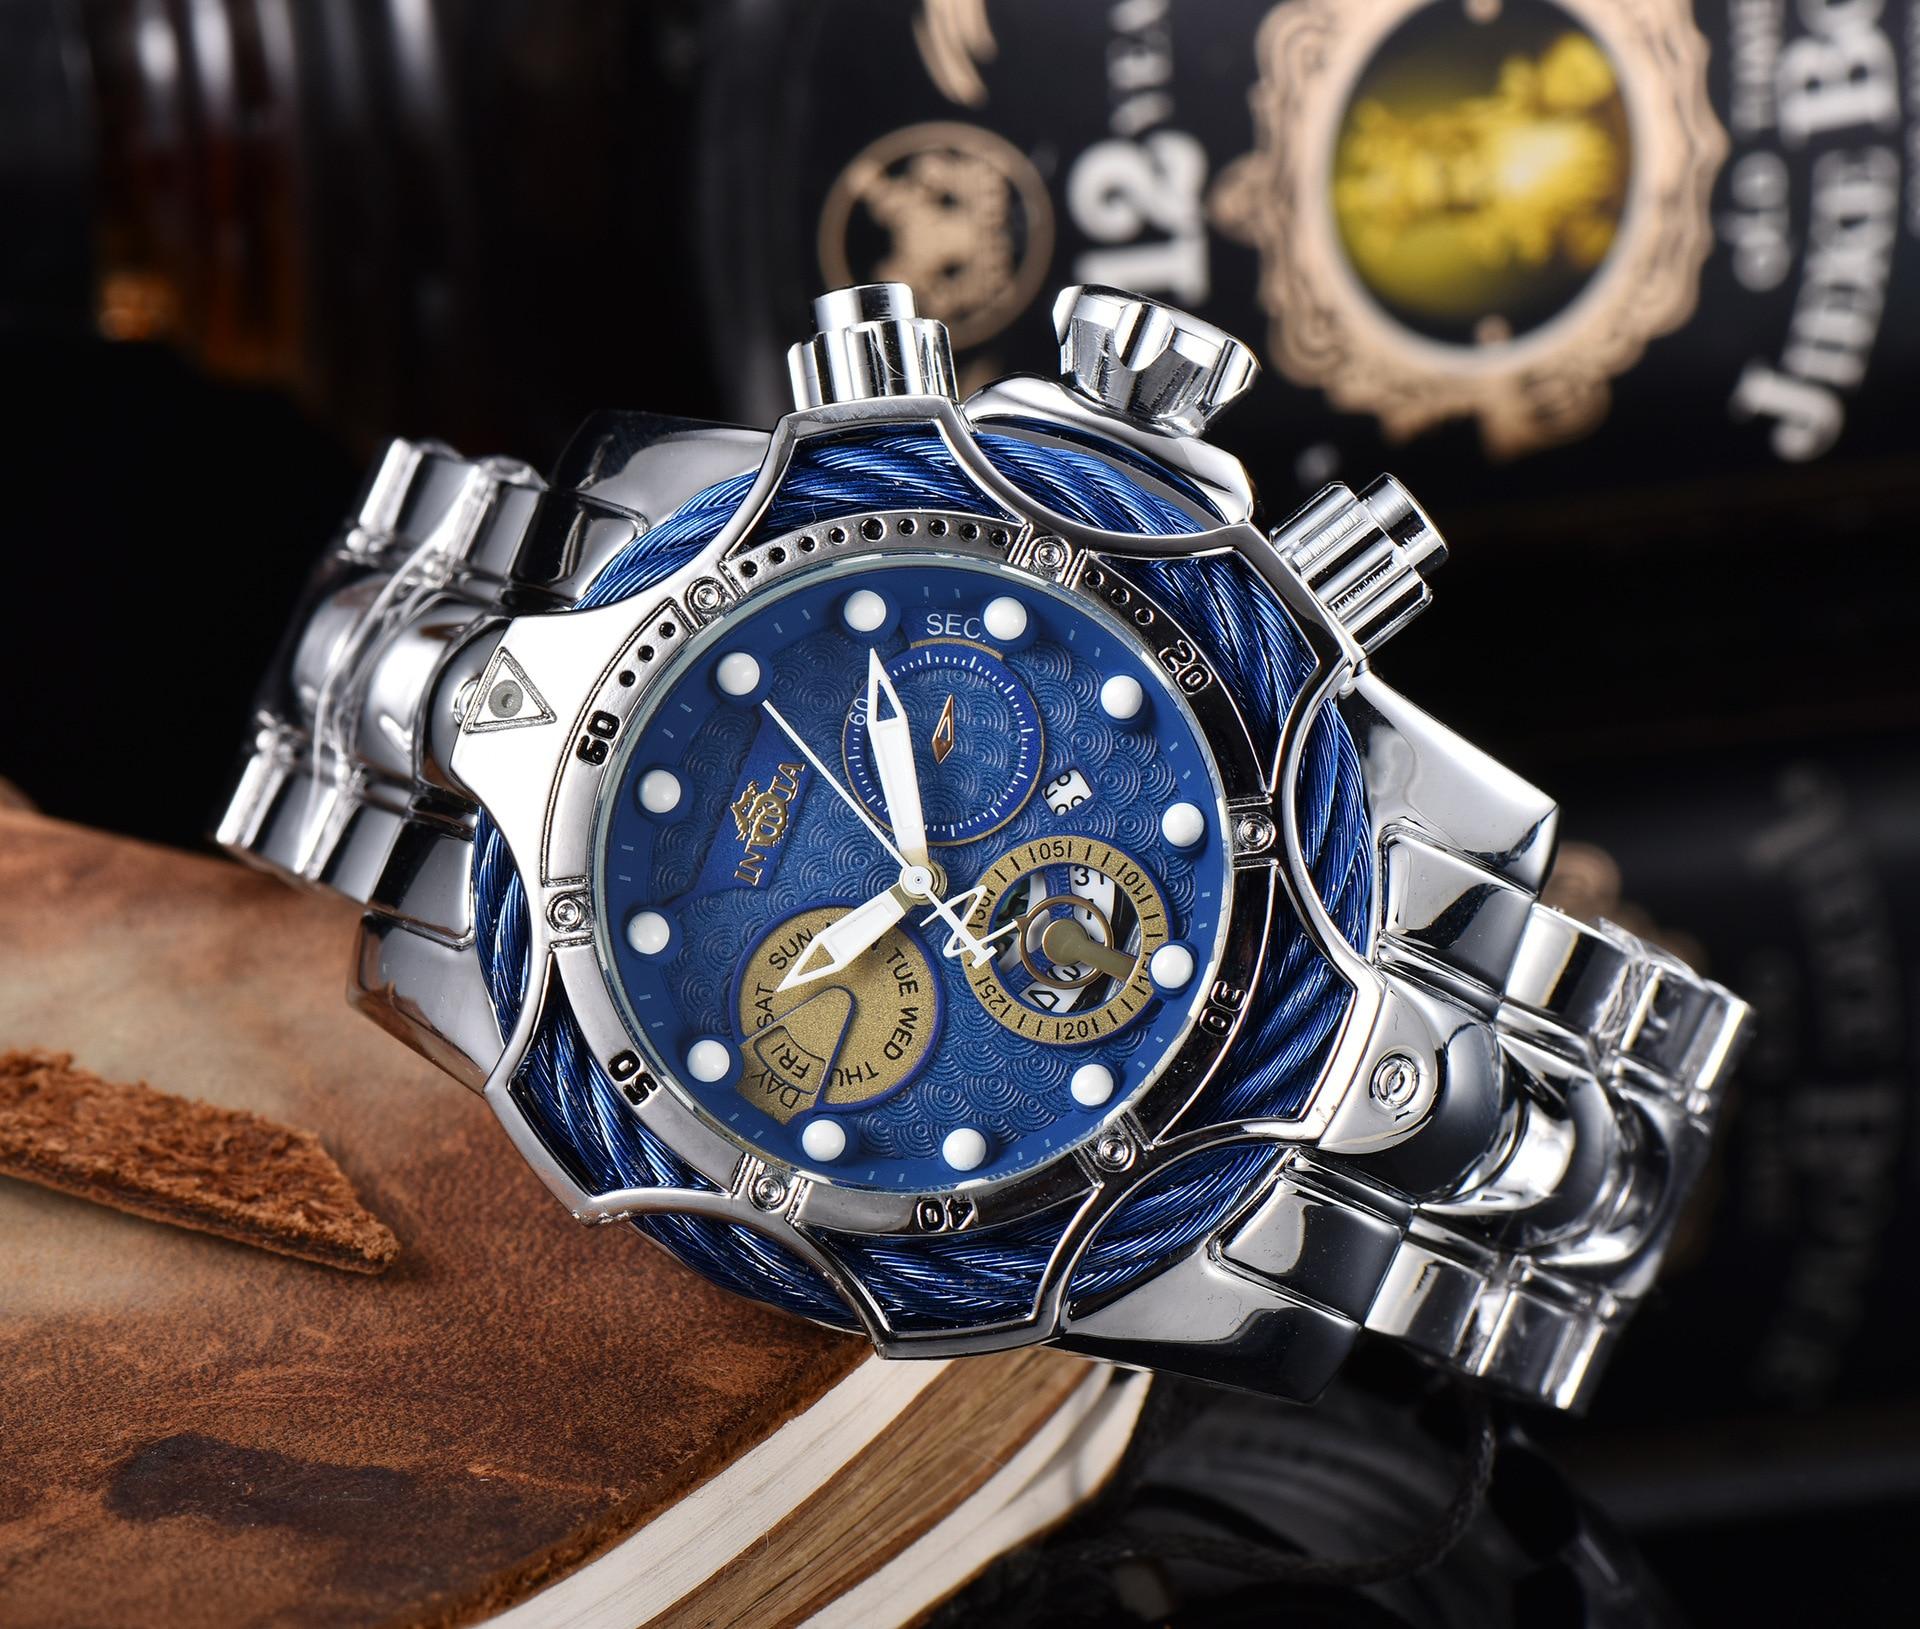 2021 luxury men's watch sports quartz business watch waterproof casual large dial watch men's gift